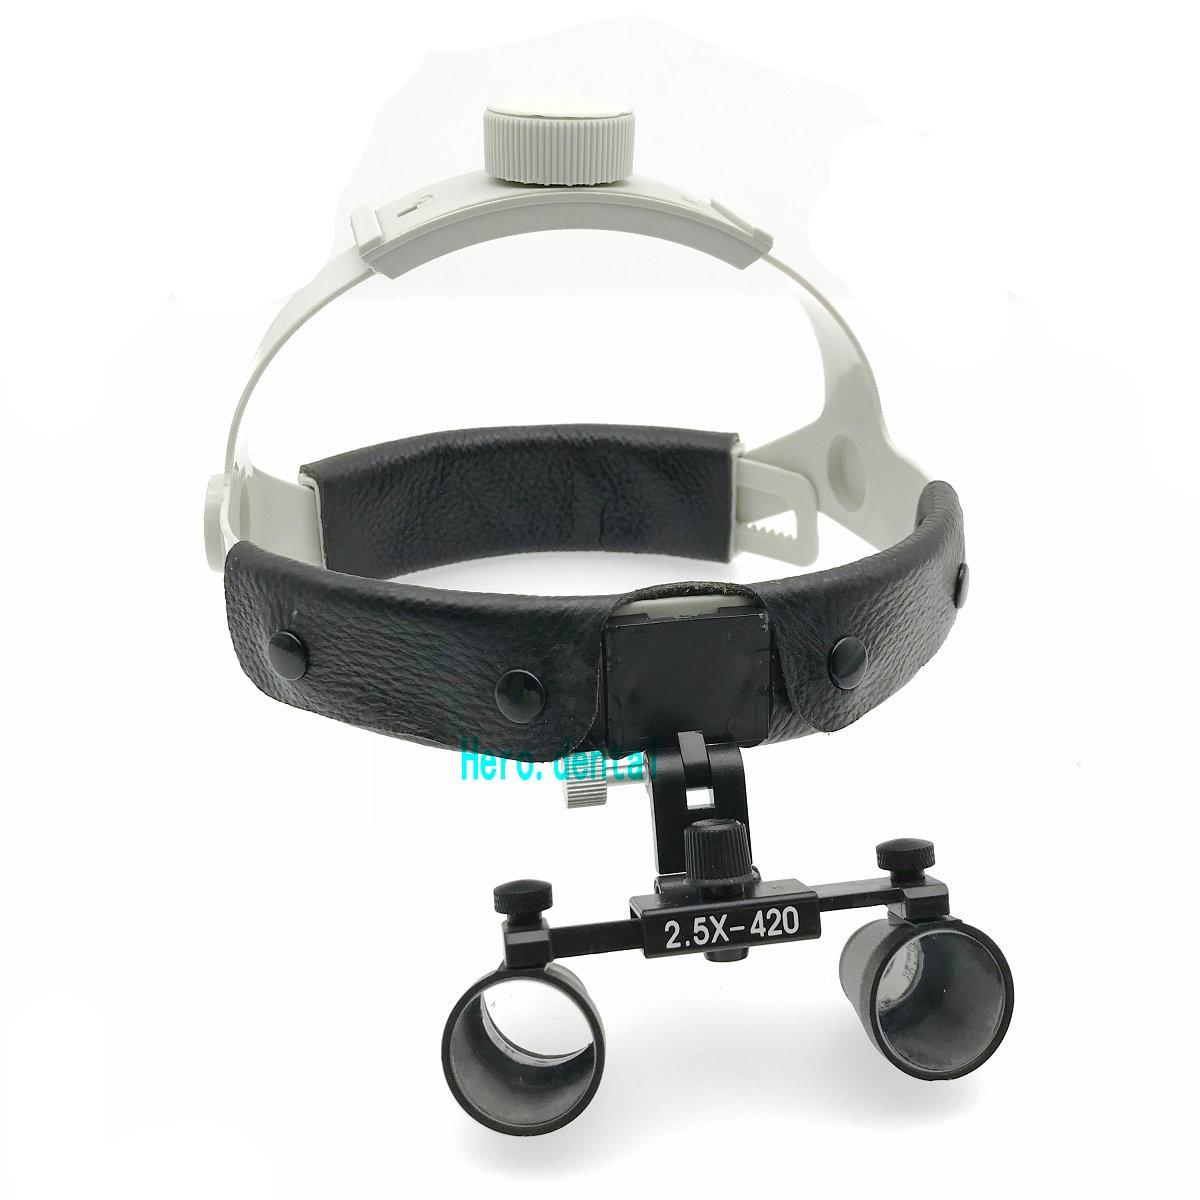 2.5X-R Dental Surgical Medical Headband Binocular Loupes Magnifier Black кольцо 1979 11 r